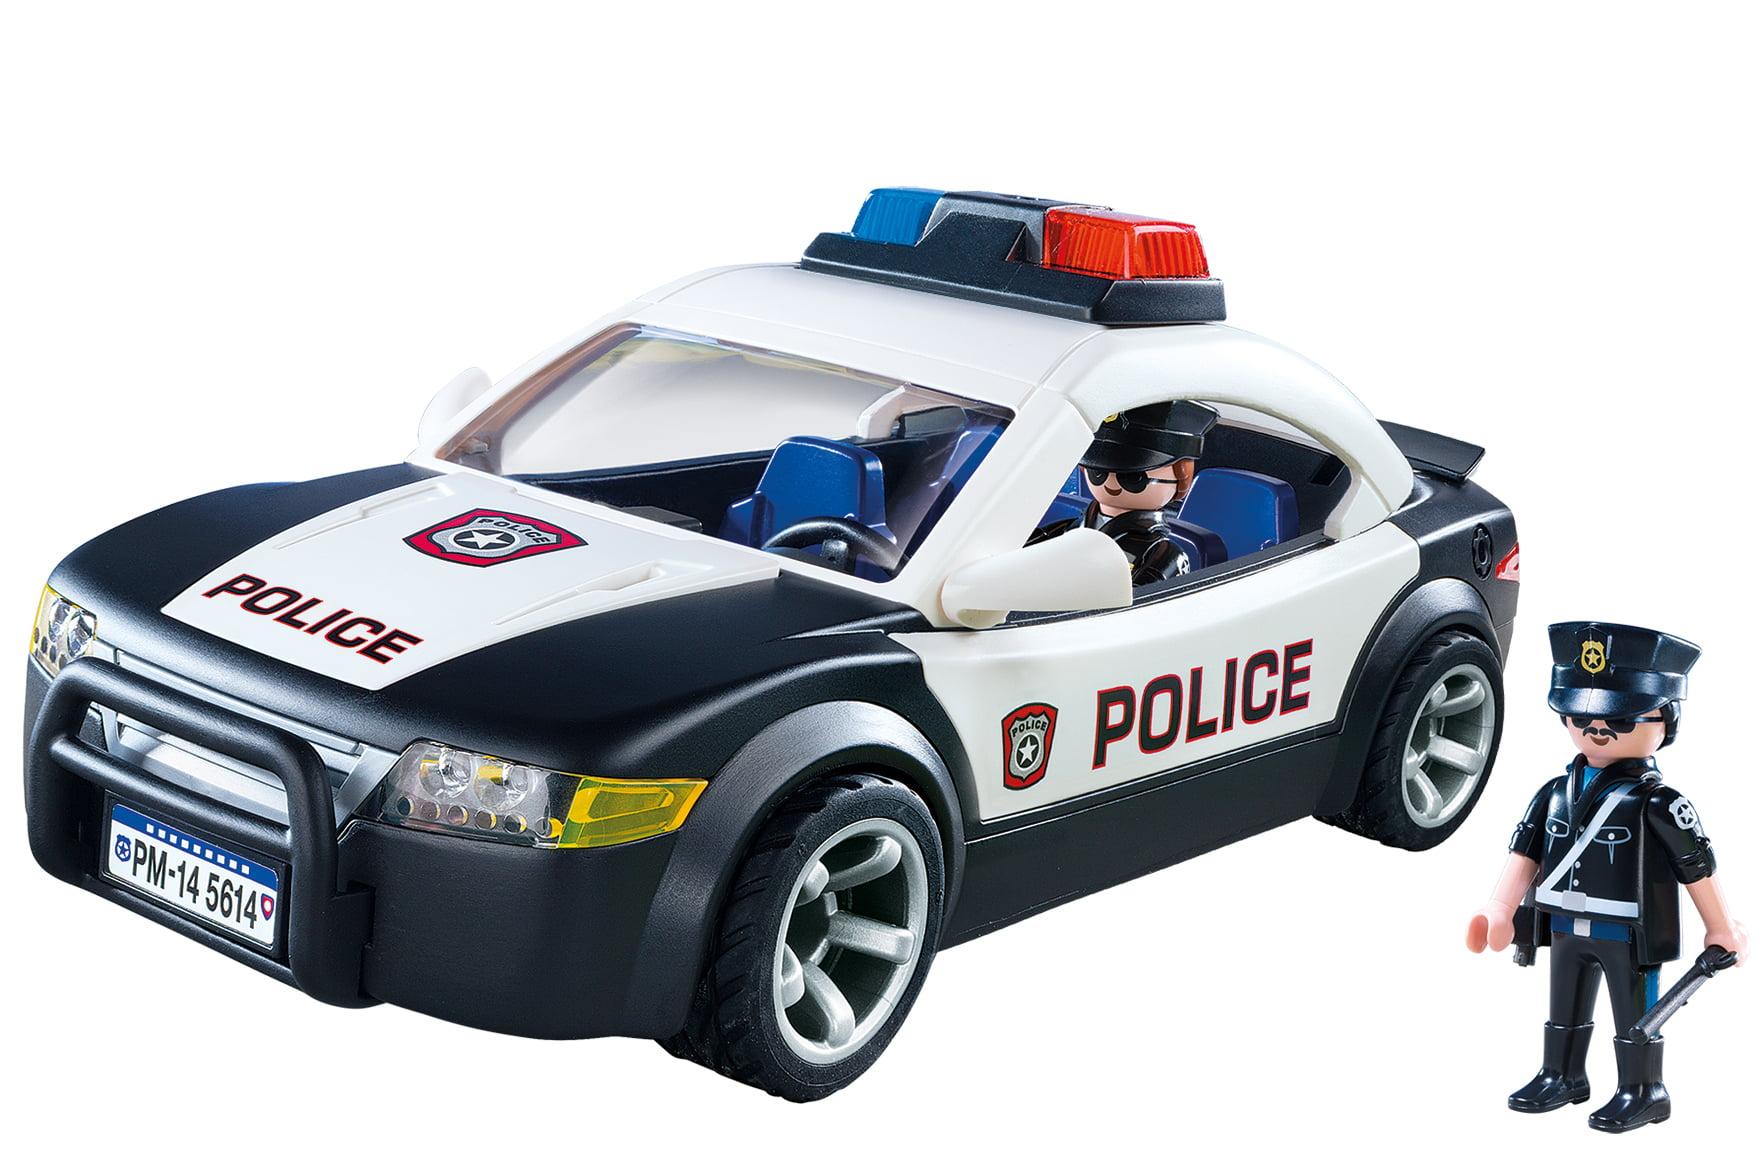 PLAYMOBIL Police Cruiser by PLAYMOBIL